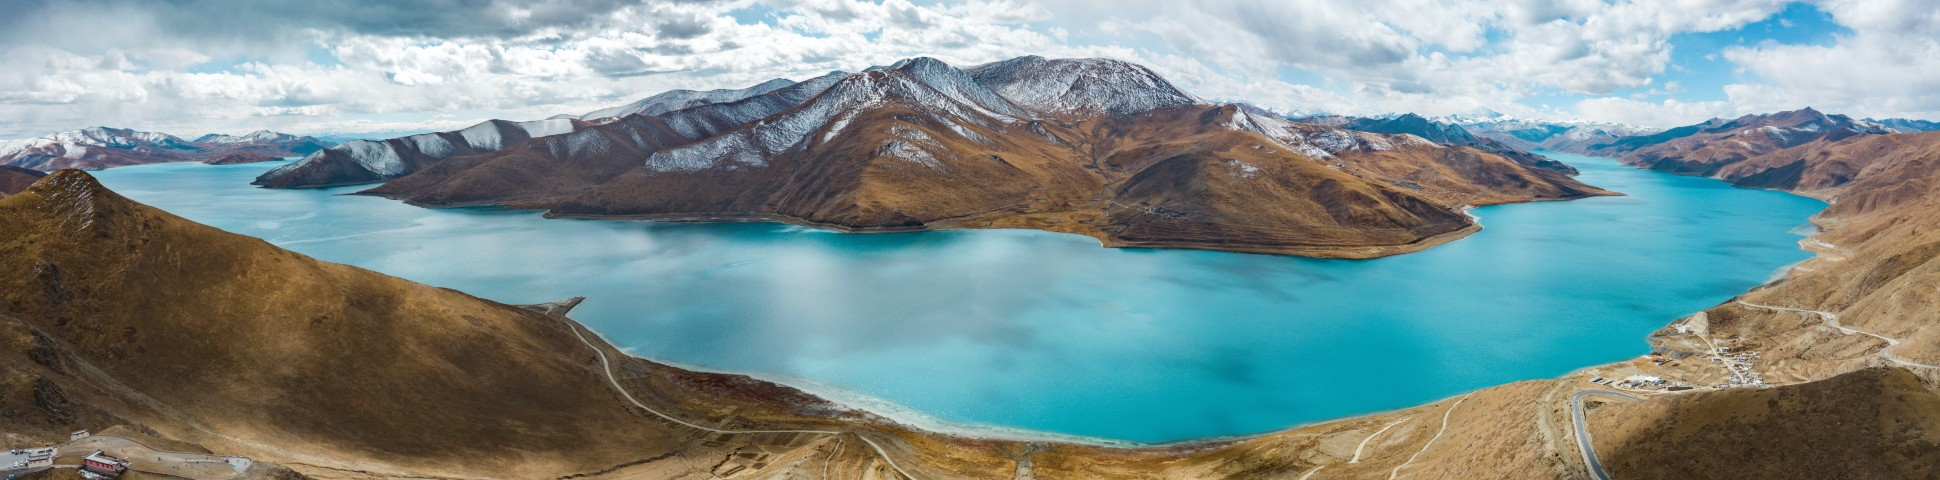 Tibet views